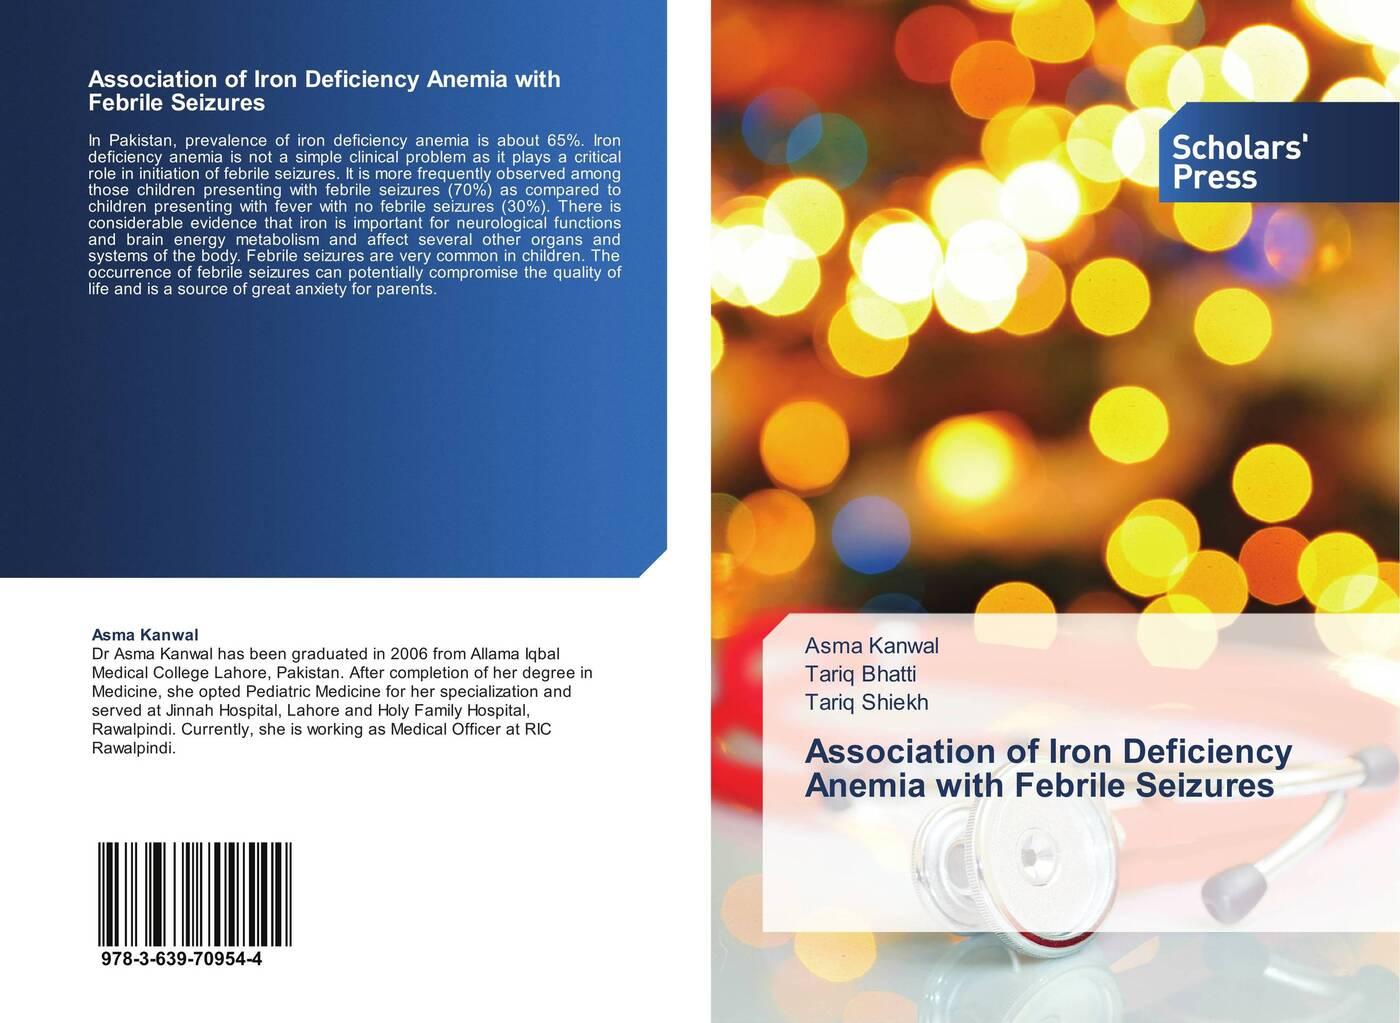 Asma KanwalTariq Bhatti and Tariq Shiekh Association of Iron Deficiency Anemia with Febrile Seizures